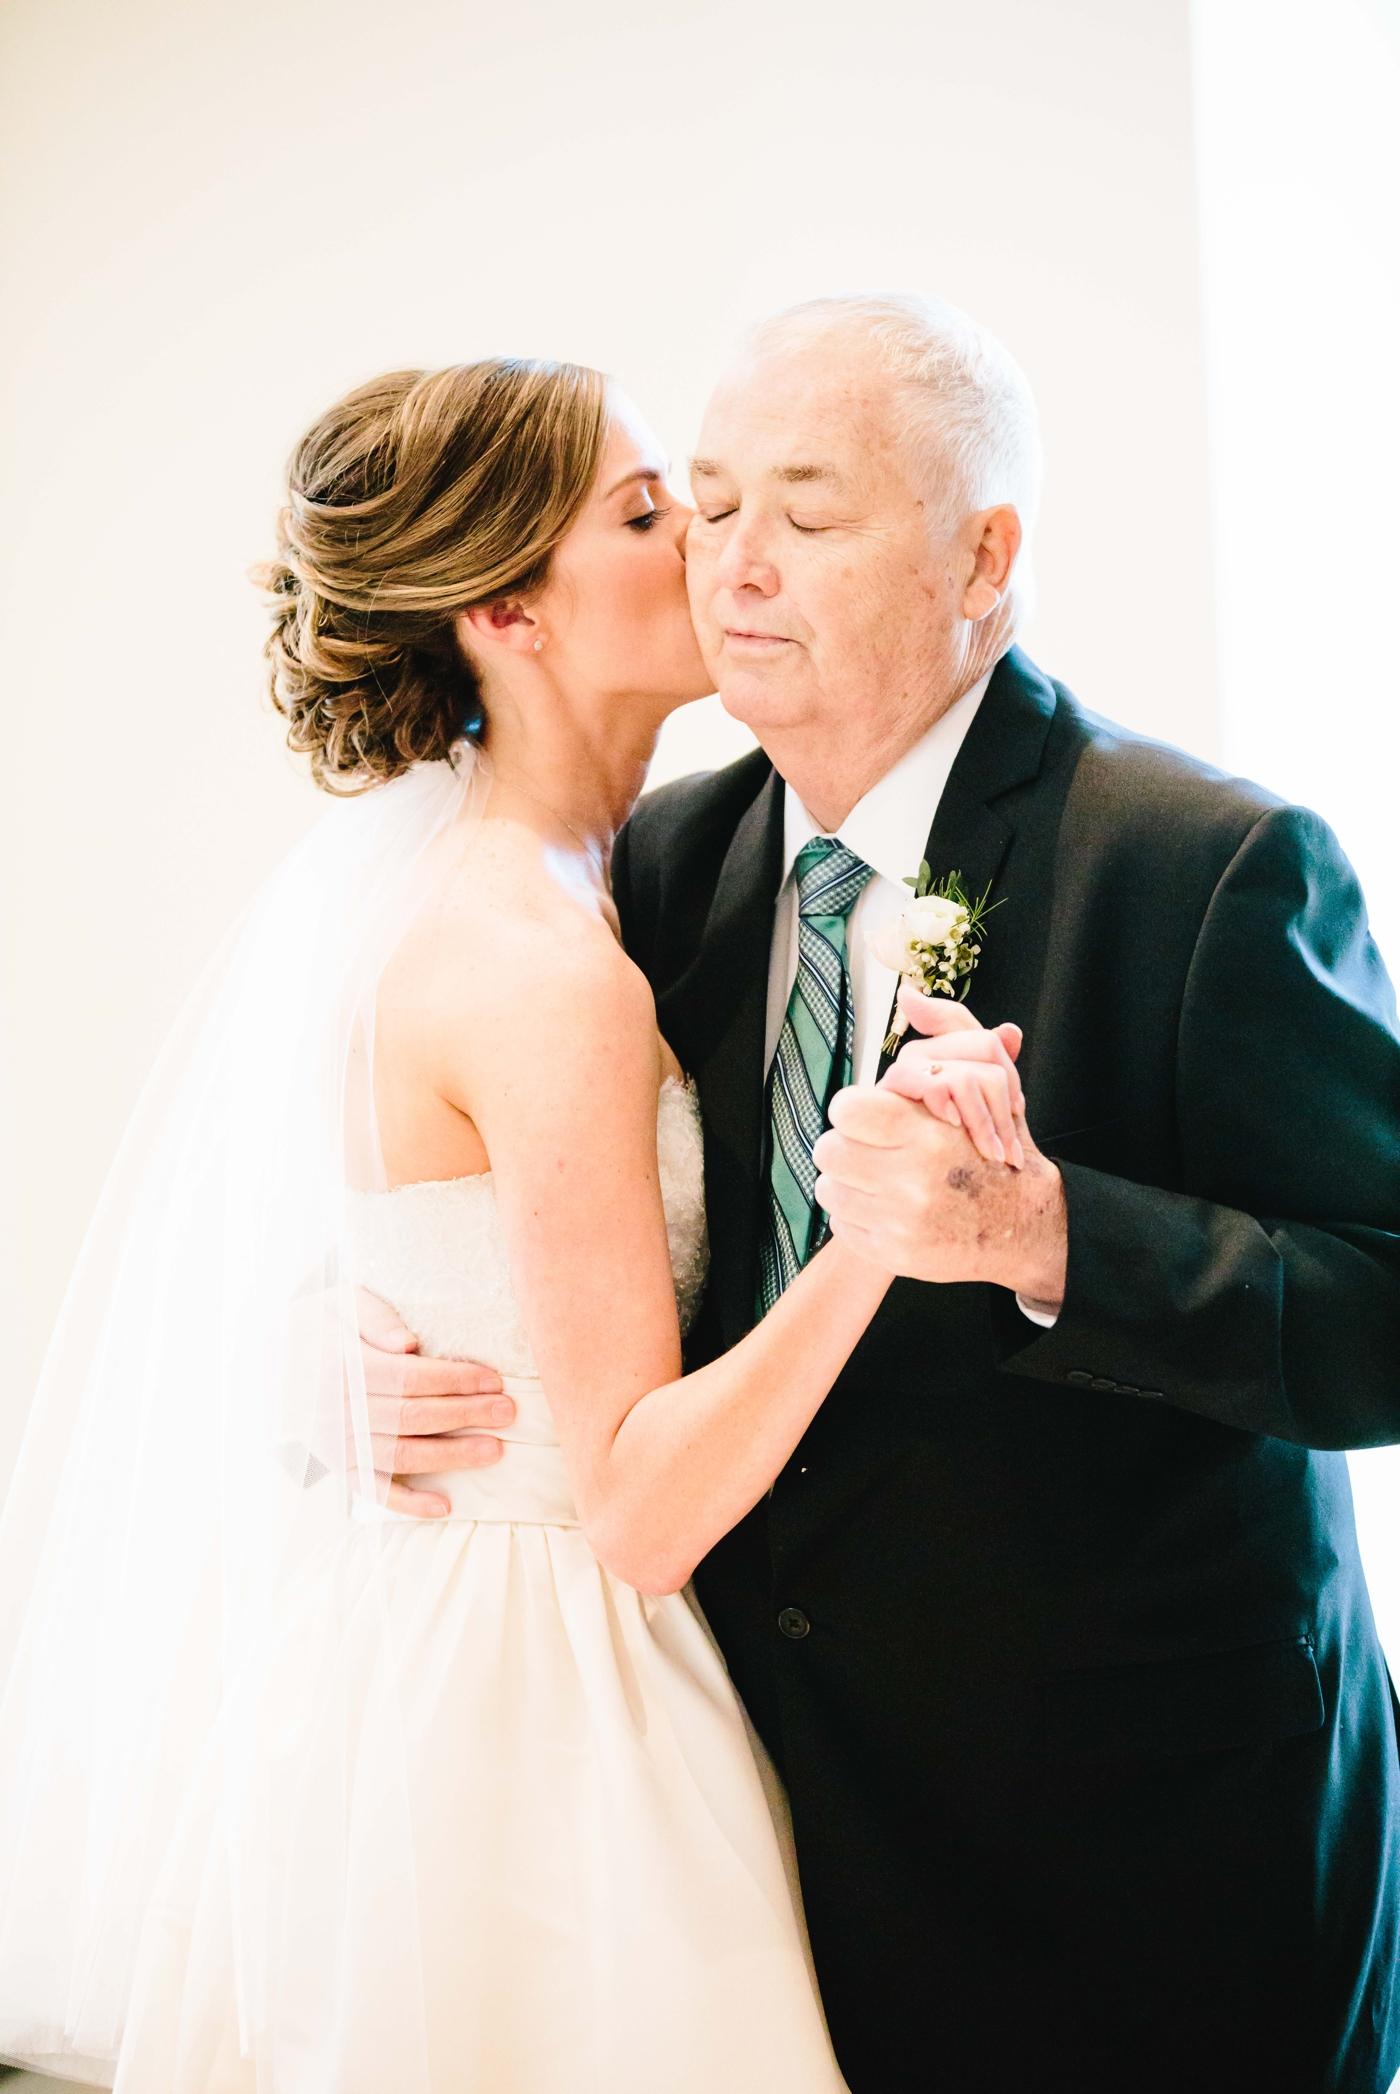 chicago-fine-art-wedding-photography-blais57